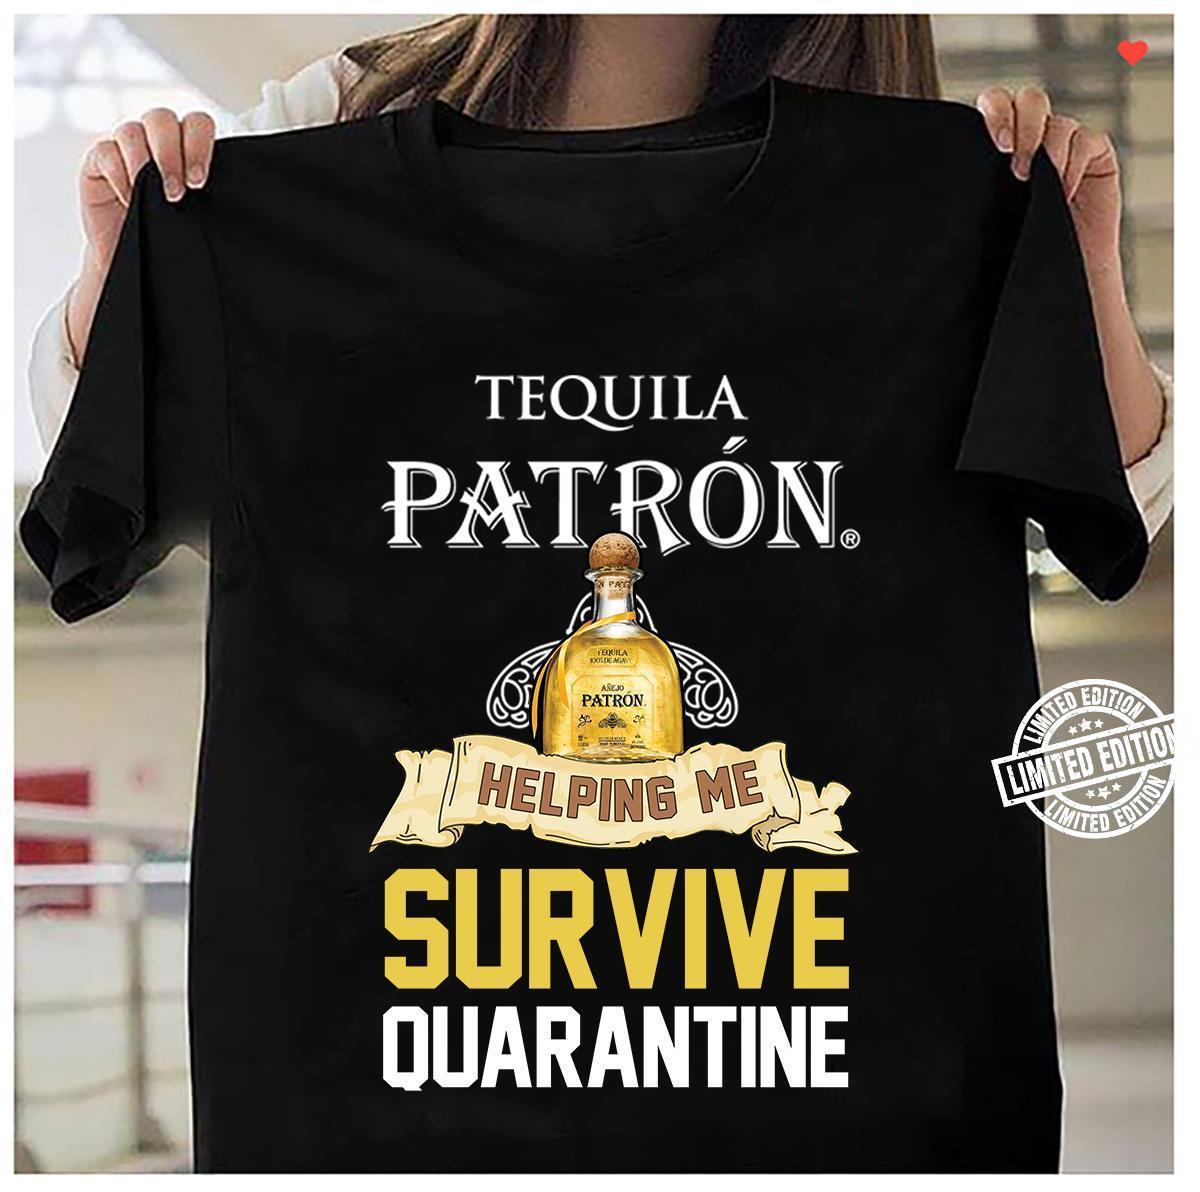 Tequila patron helping me survive quarantine shirt